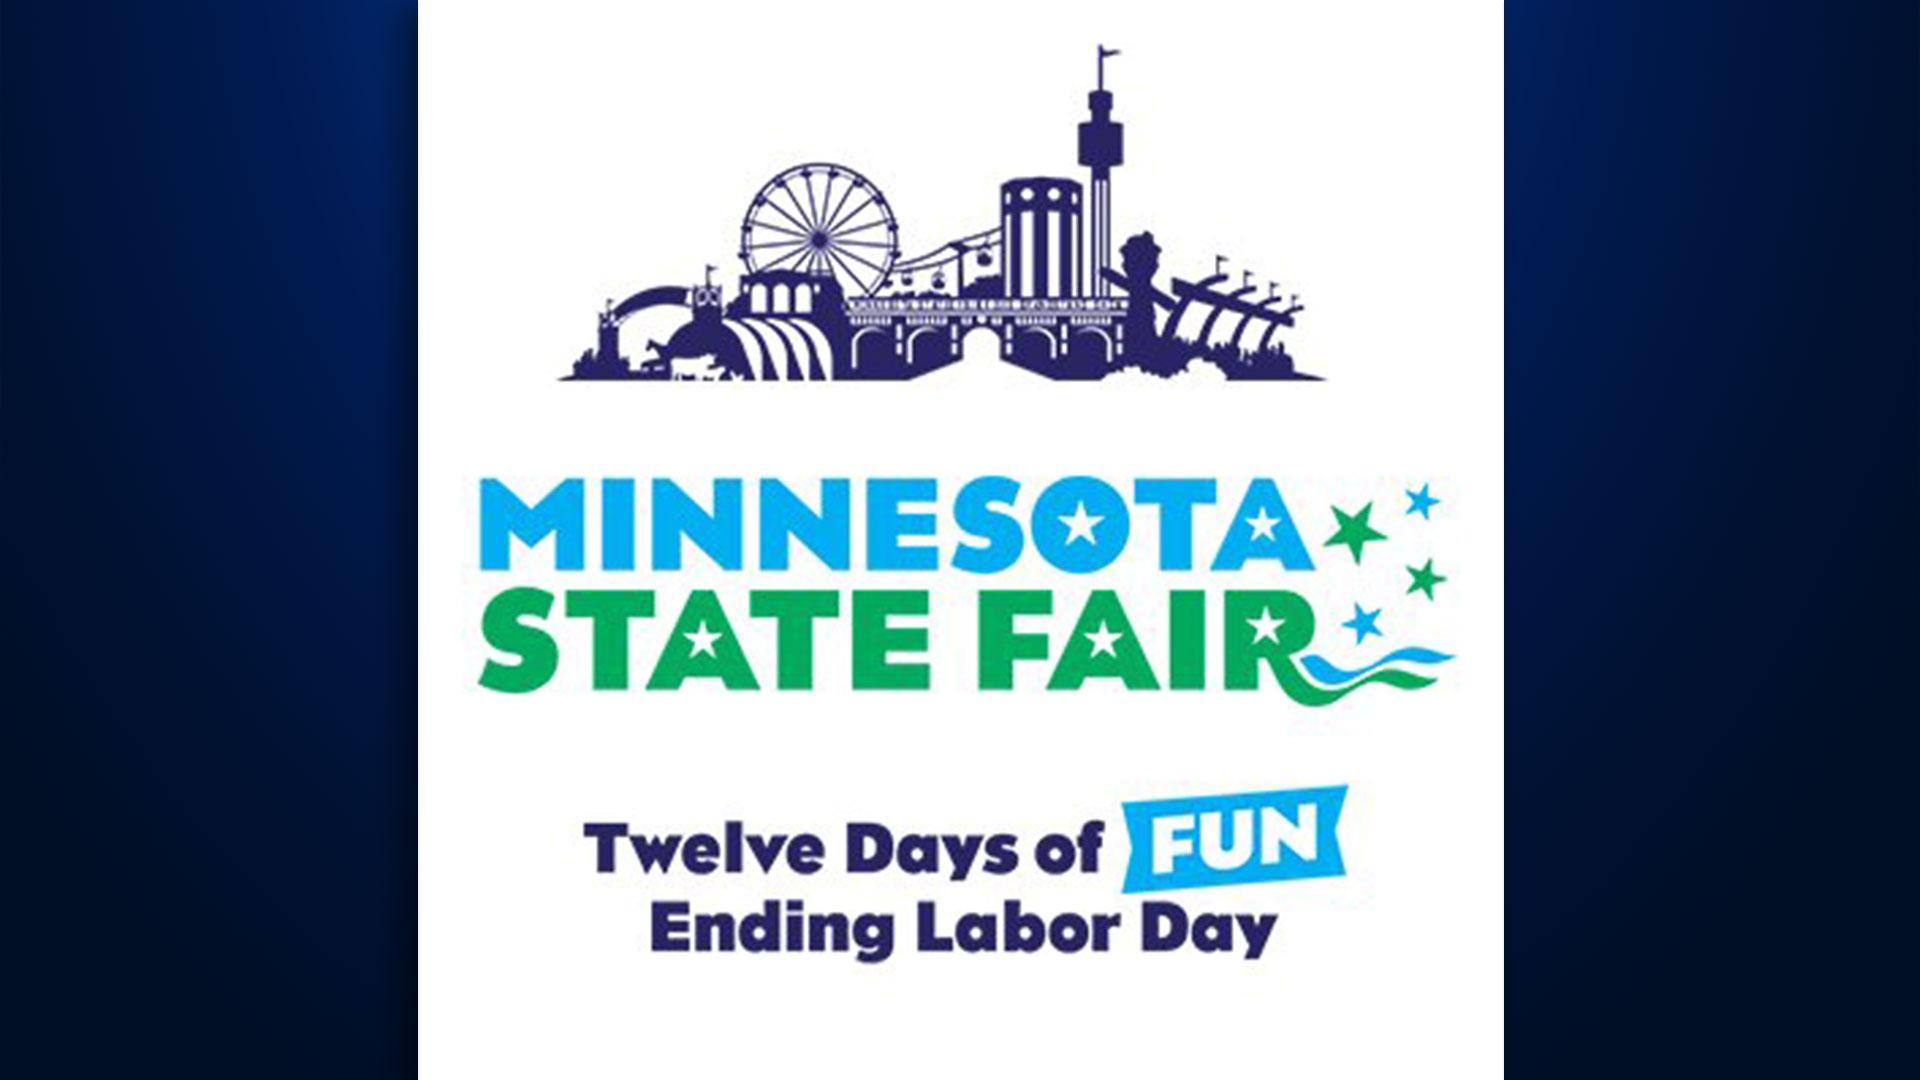 KELO Minnesota State Fair Dark Background